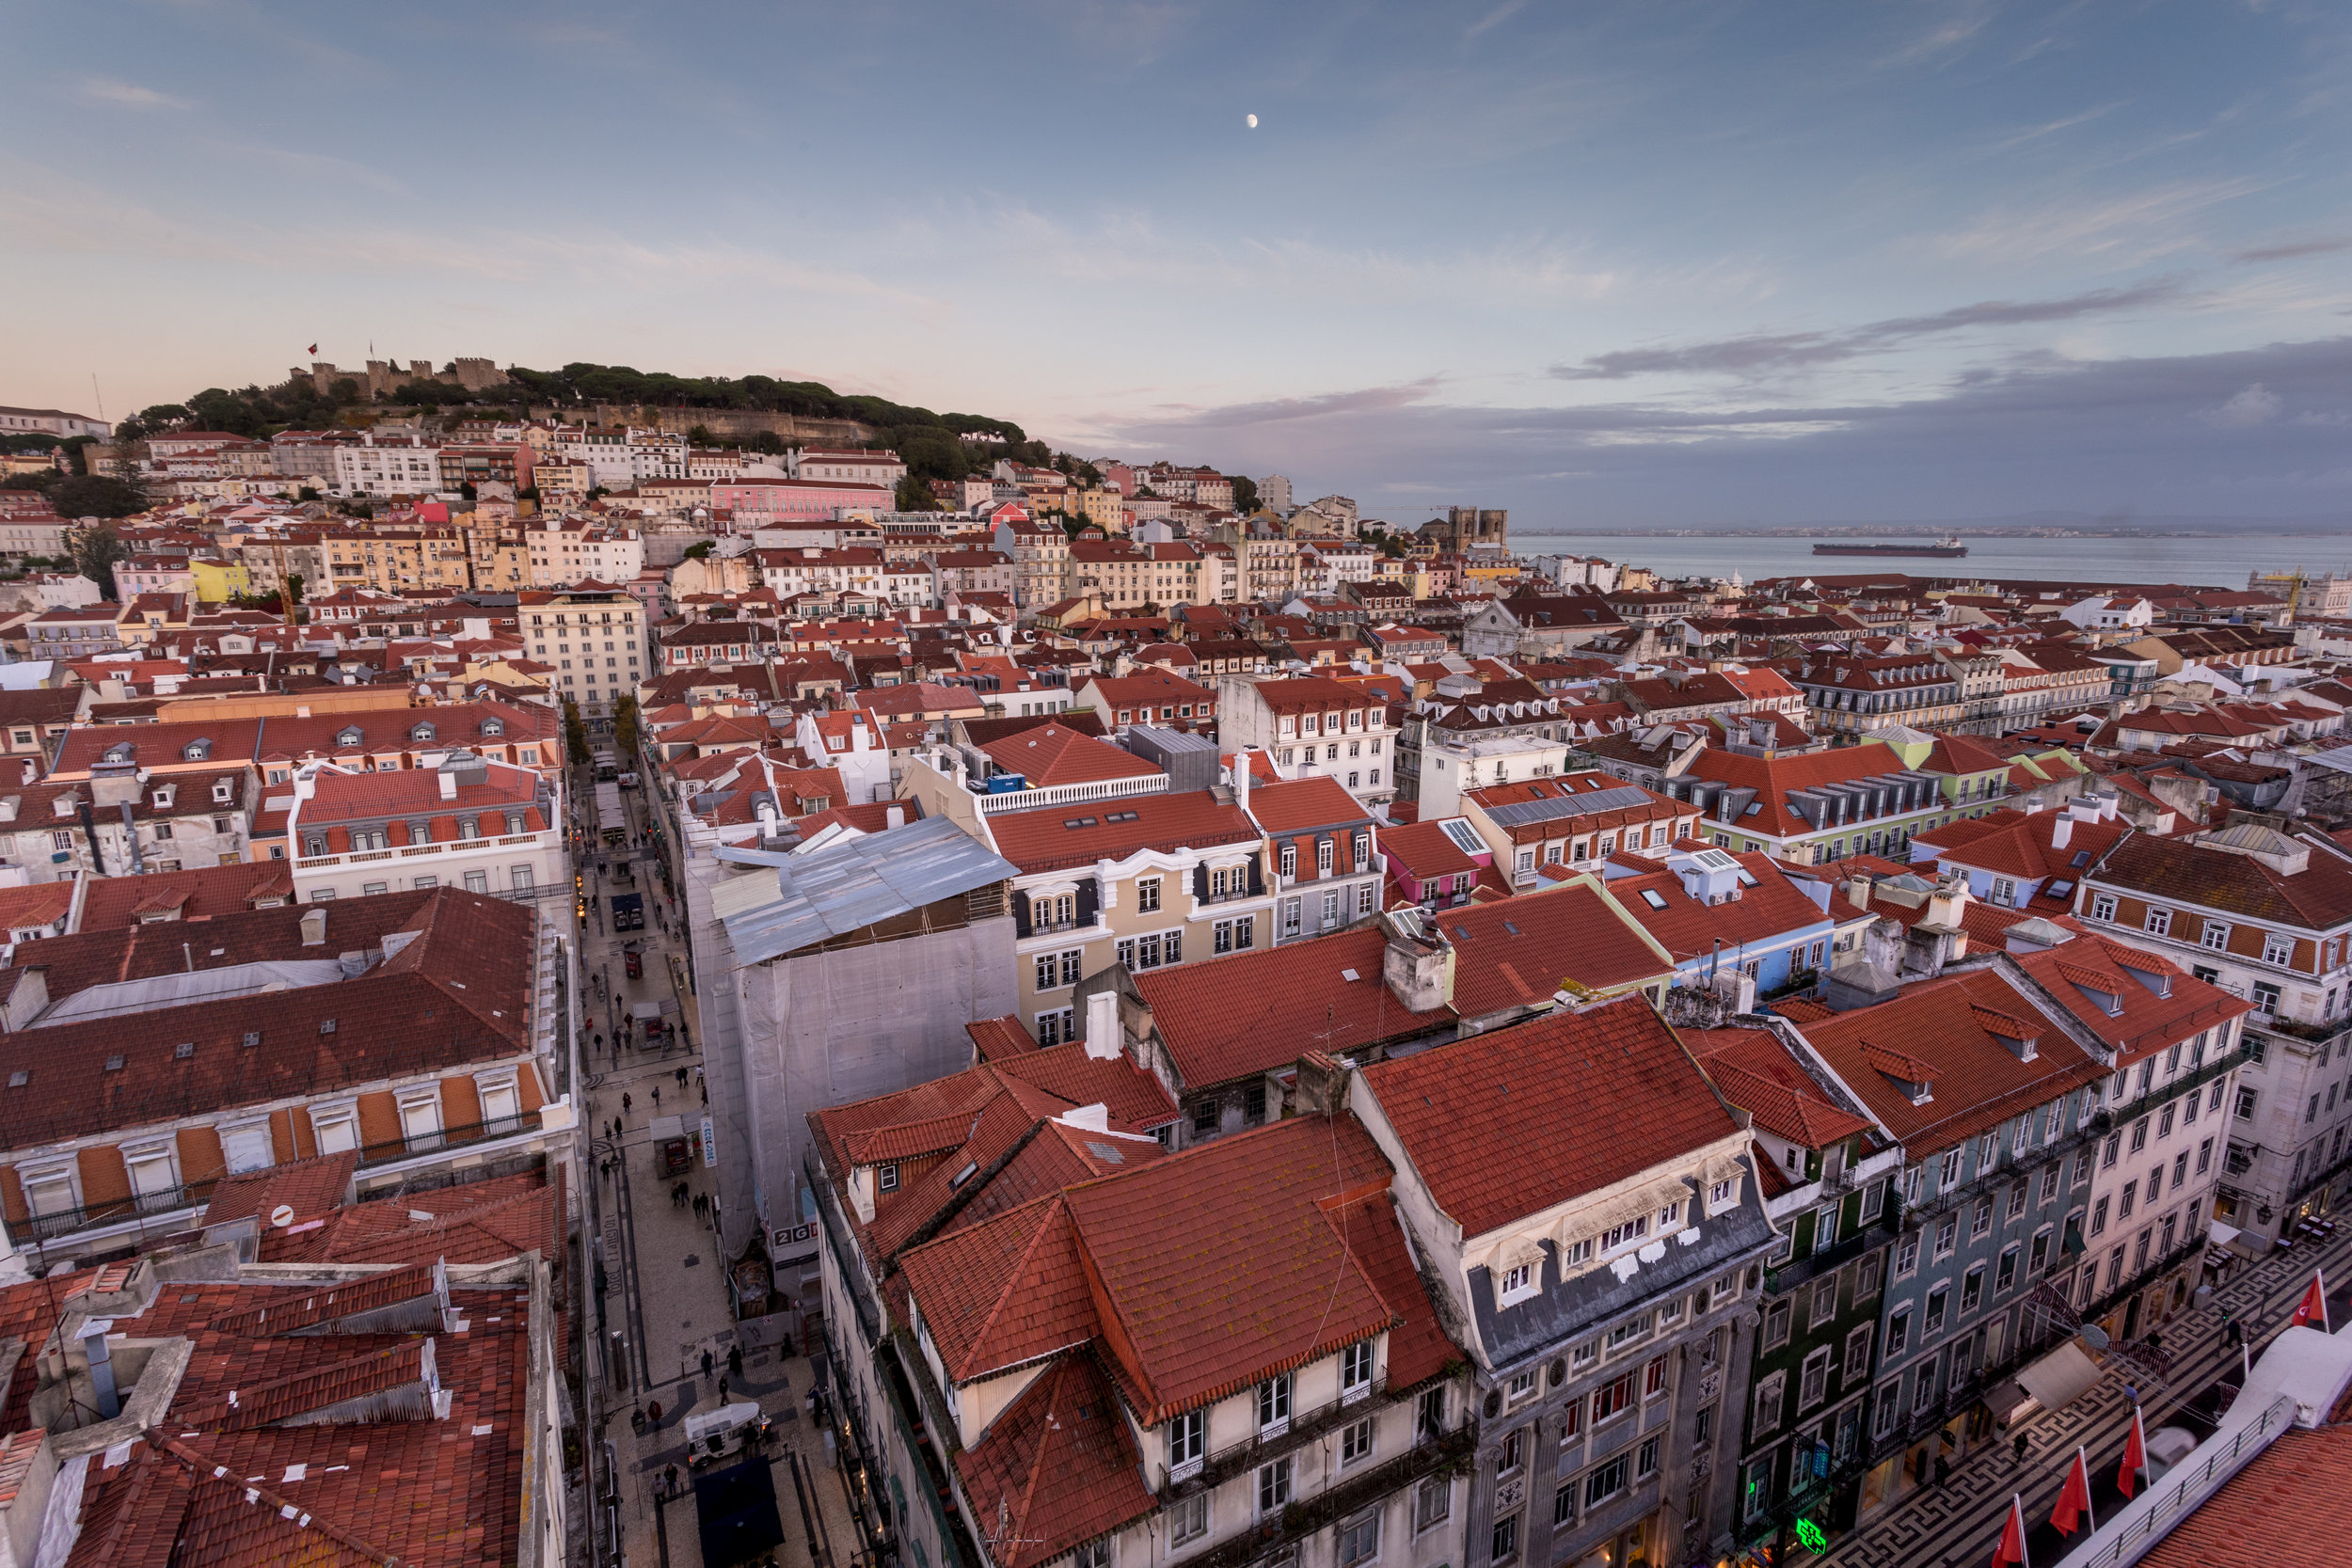 Sunset. Lisbon, Portugal (Nov. 2018)